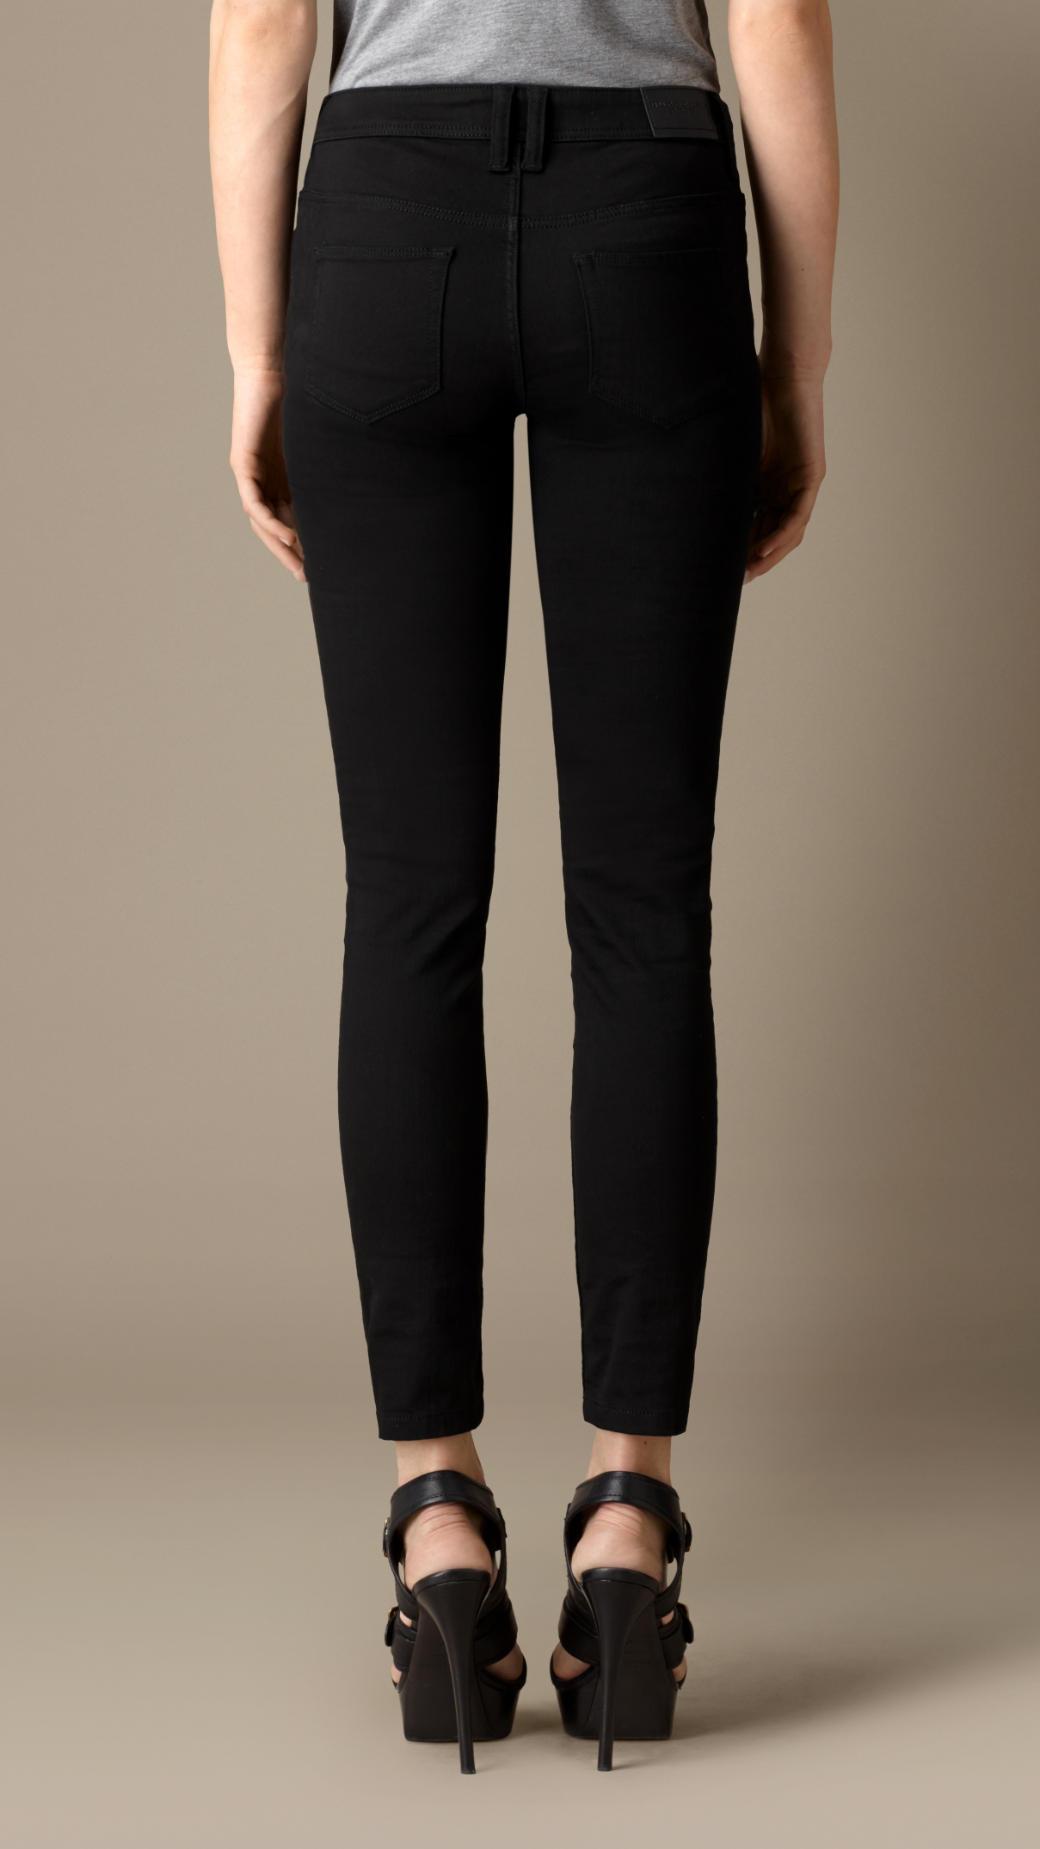 burberry slim fit regular rise power stretch jeans in black lyst. Black Bedroom Furniture Sets. Home Design Ideas